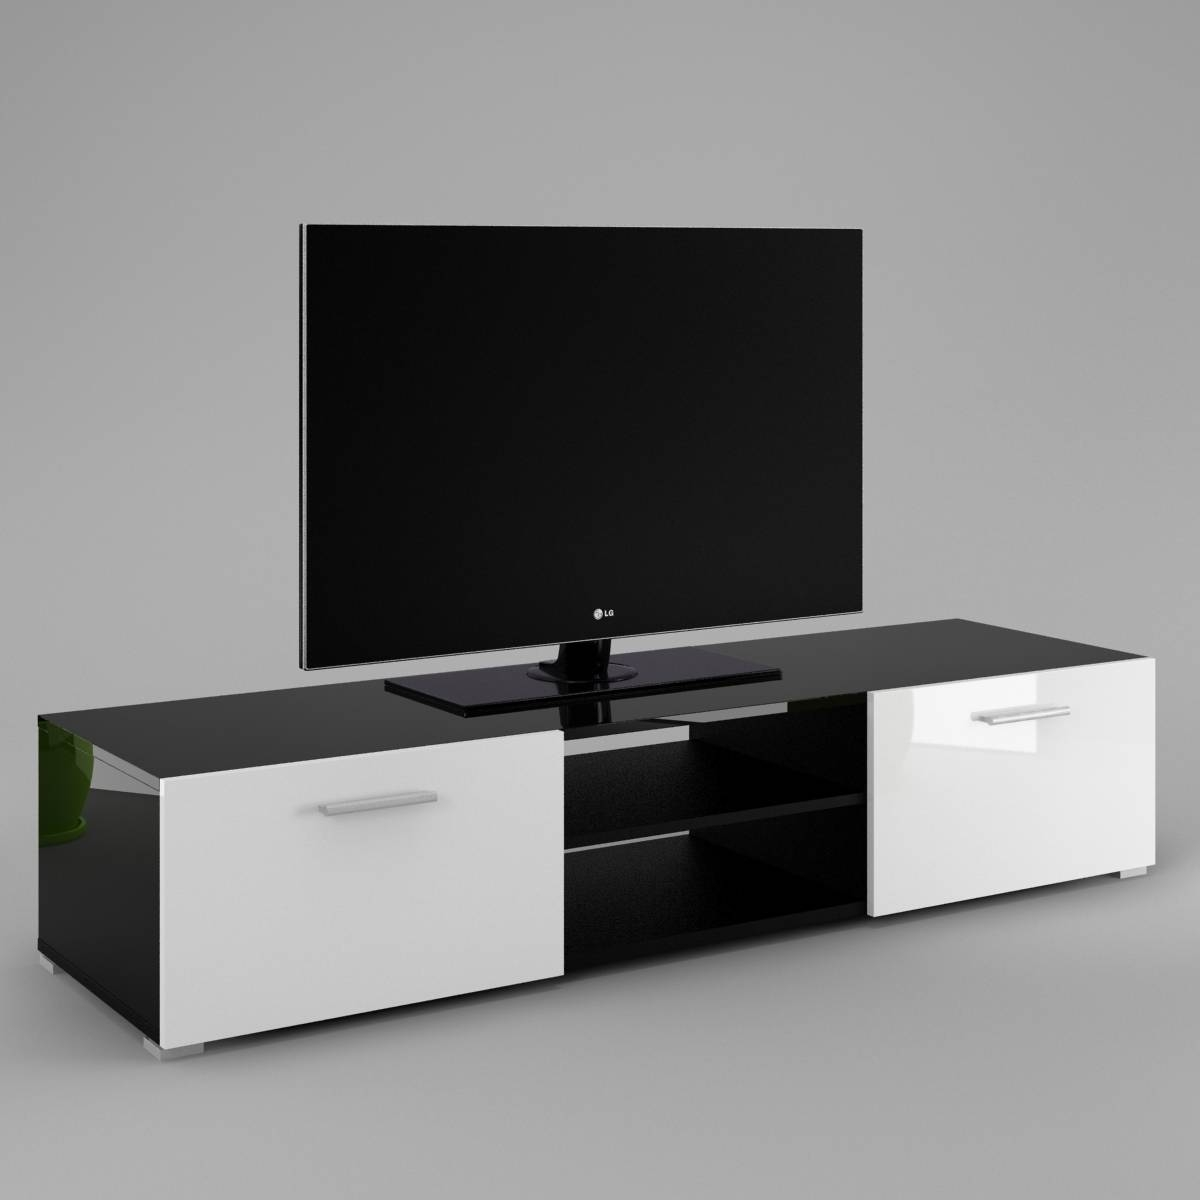 Tv Cabinet Luna – Labi Furniturelabi Furniture Within Black Gloss Tv Cabinet (View 9 of 15)